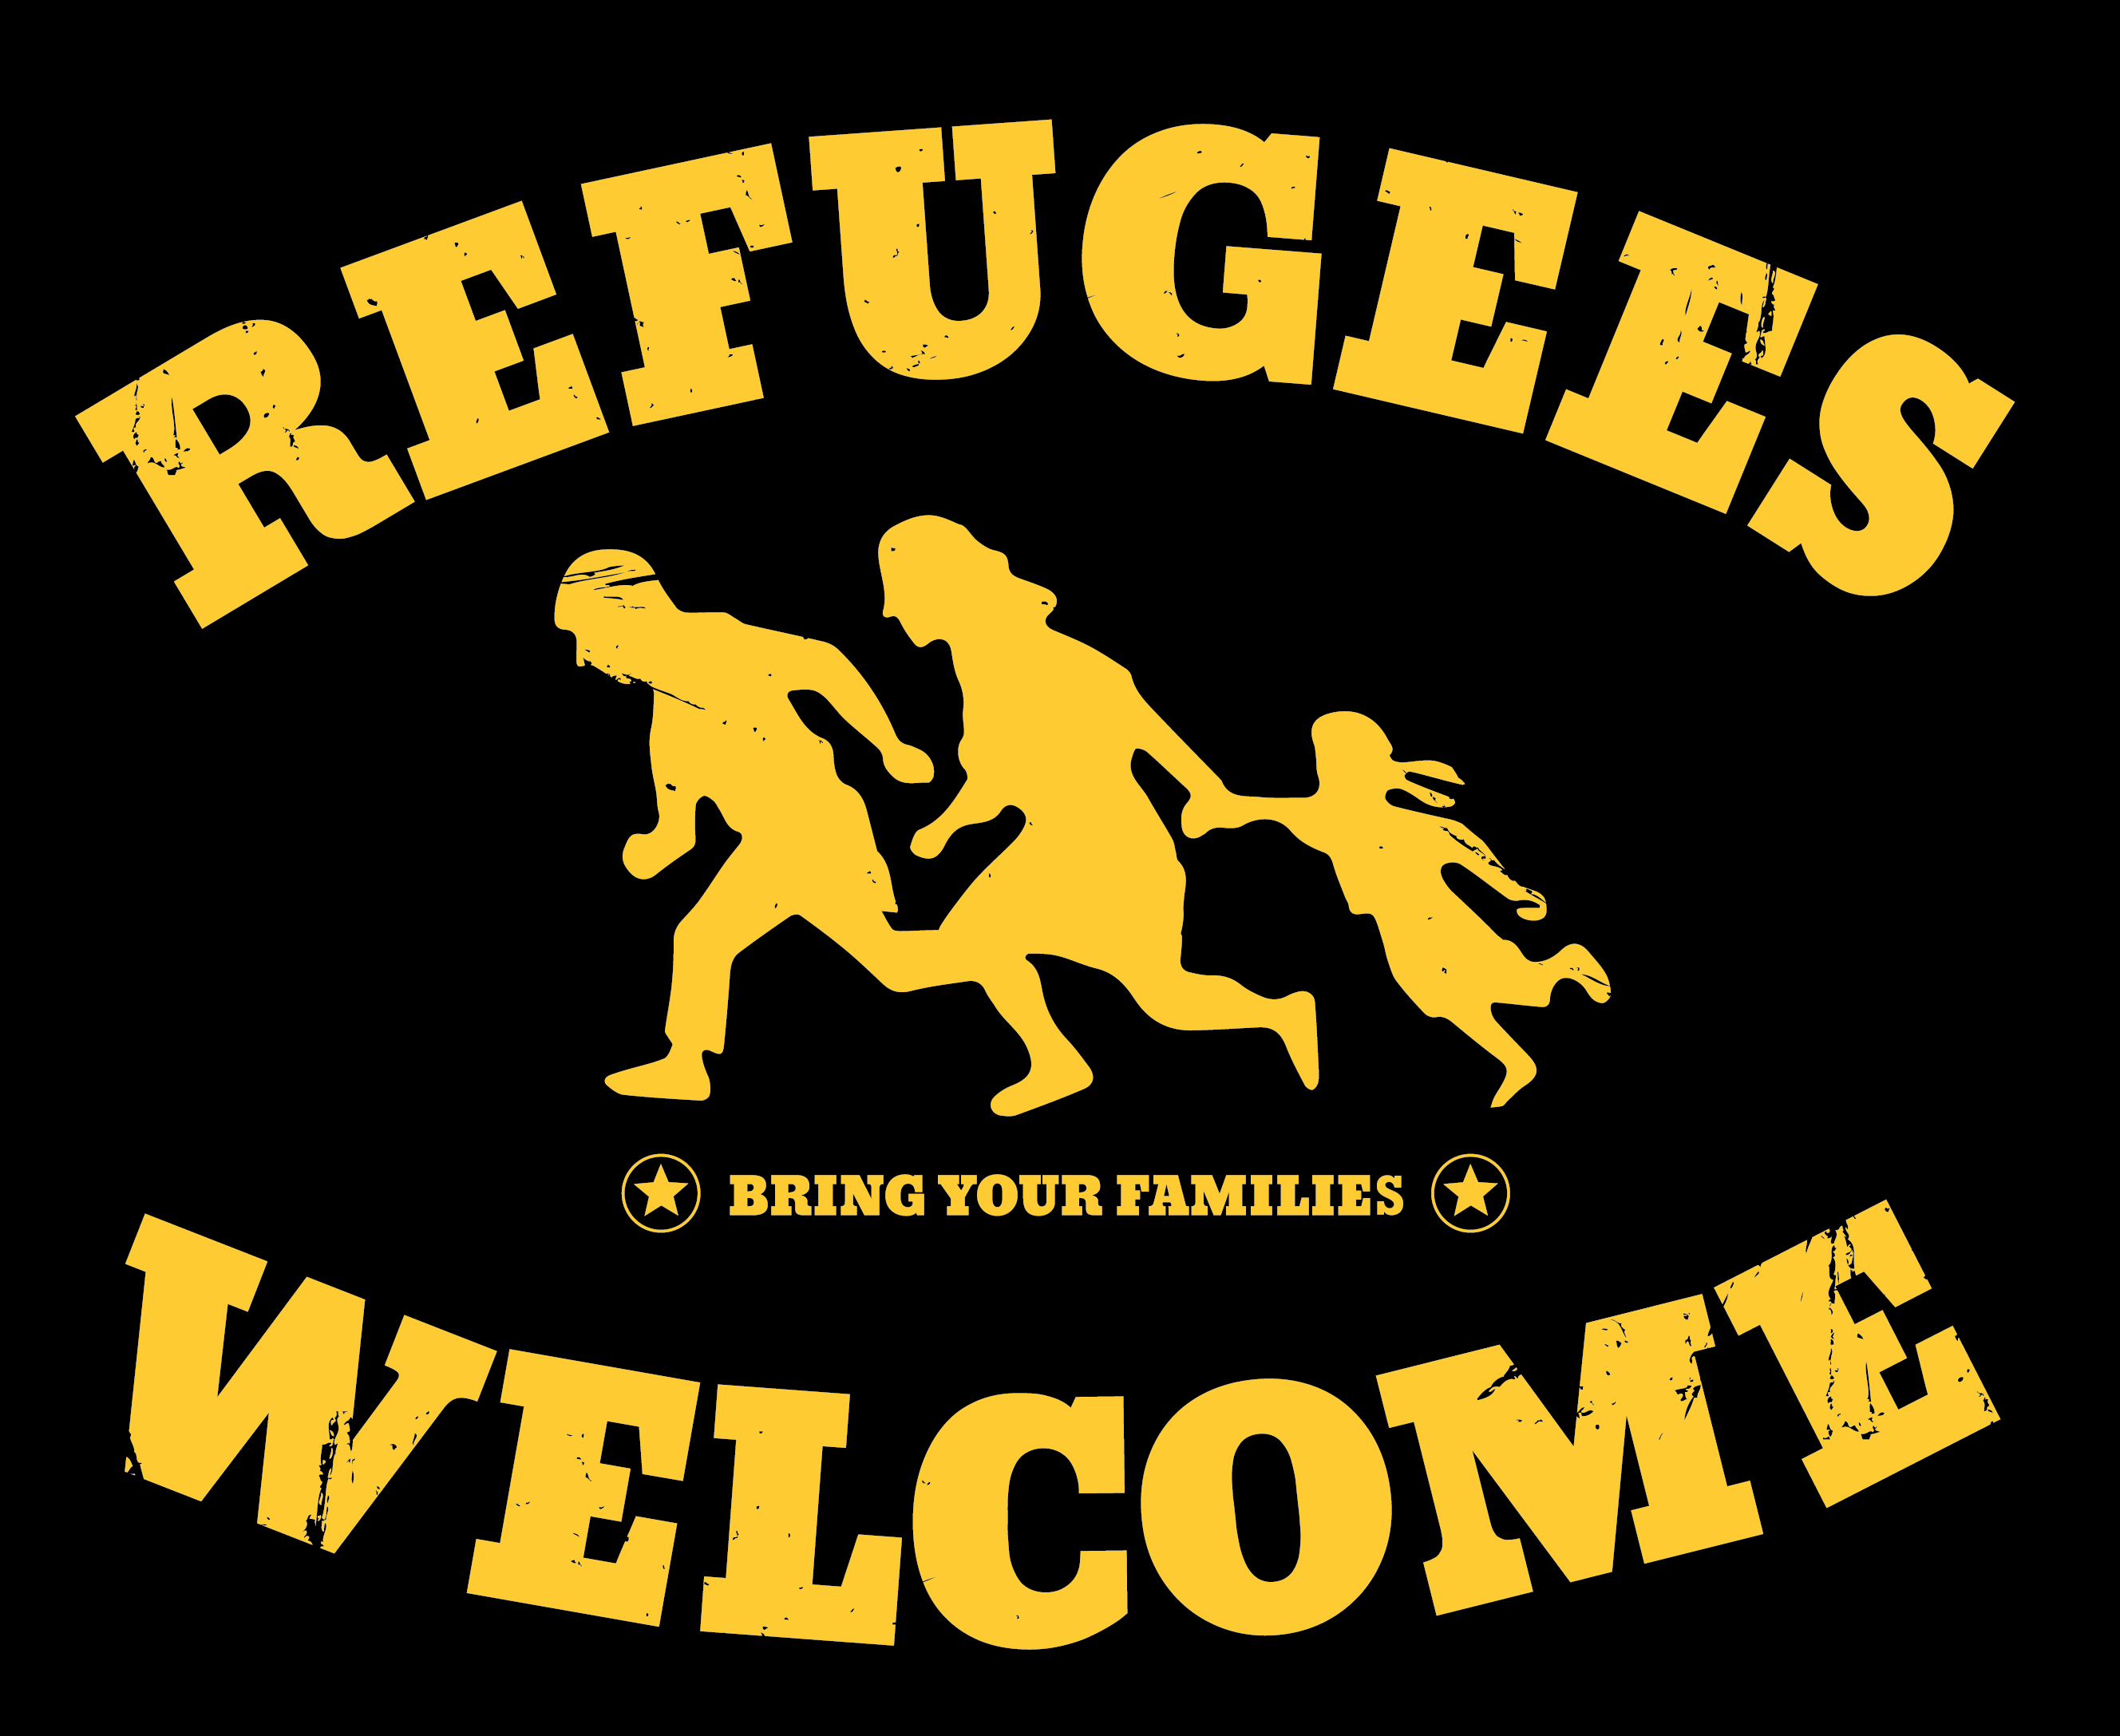 Basta guerra ai migranti